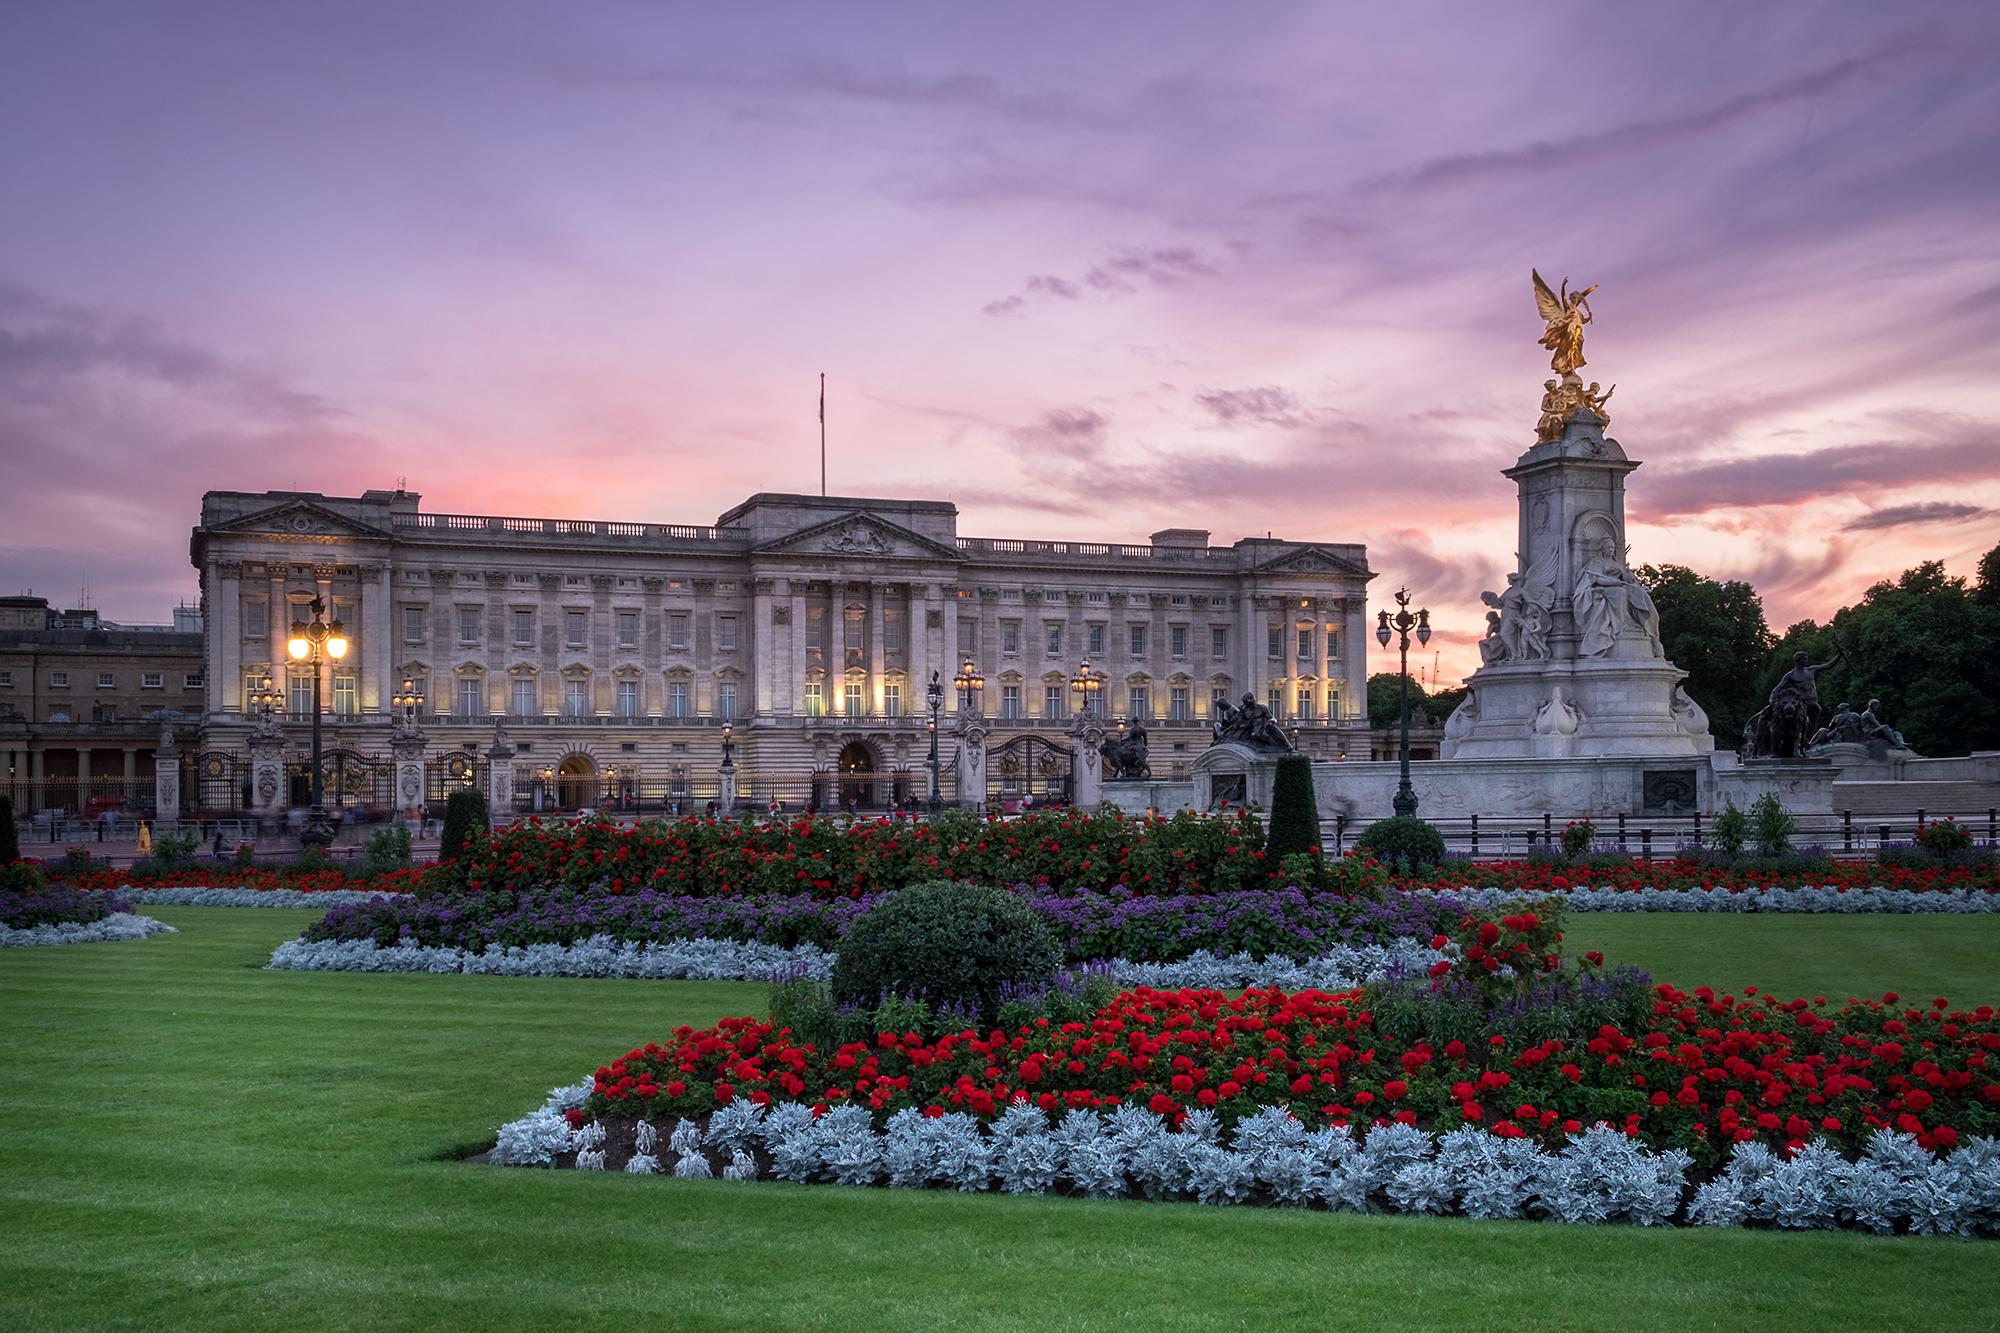 Photo of Buckingham Palace in London taken at sunset by Trevor Sherwin